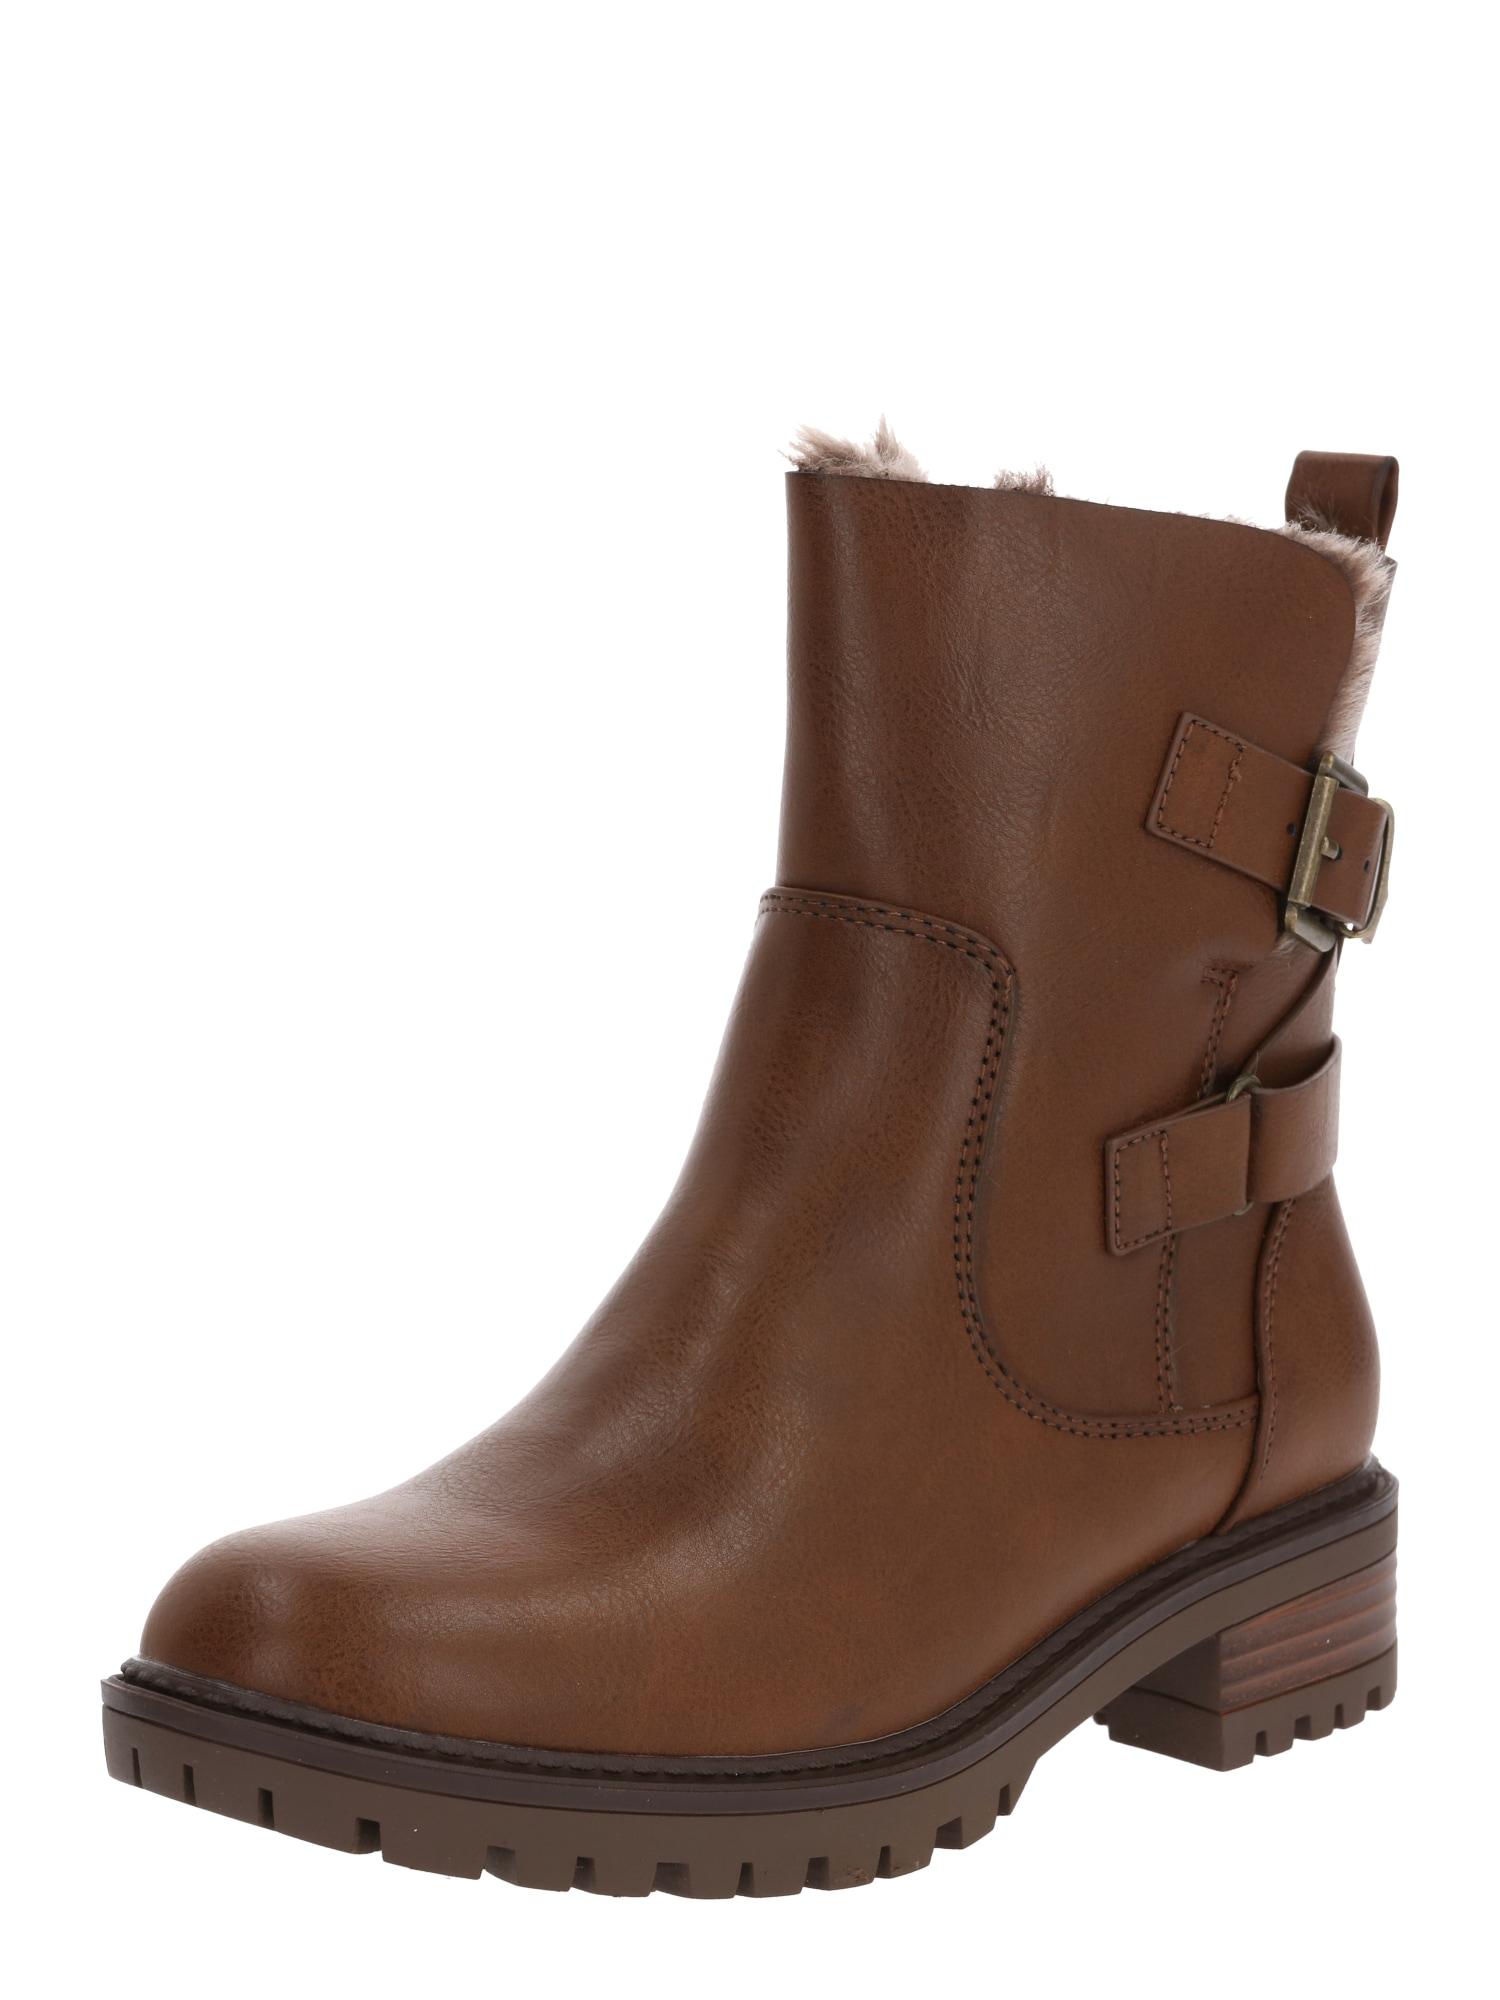 Dorothy Perkins Auliniai batai ruda